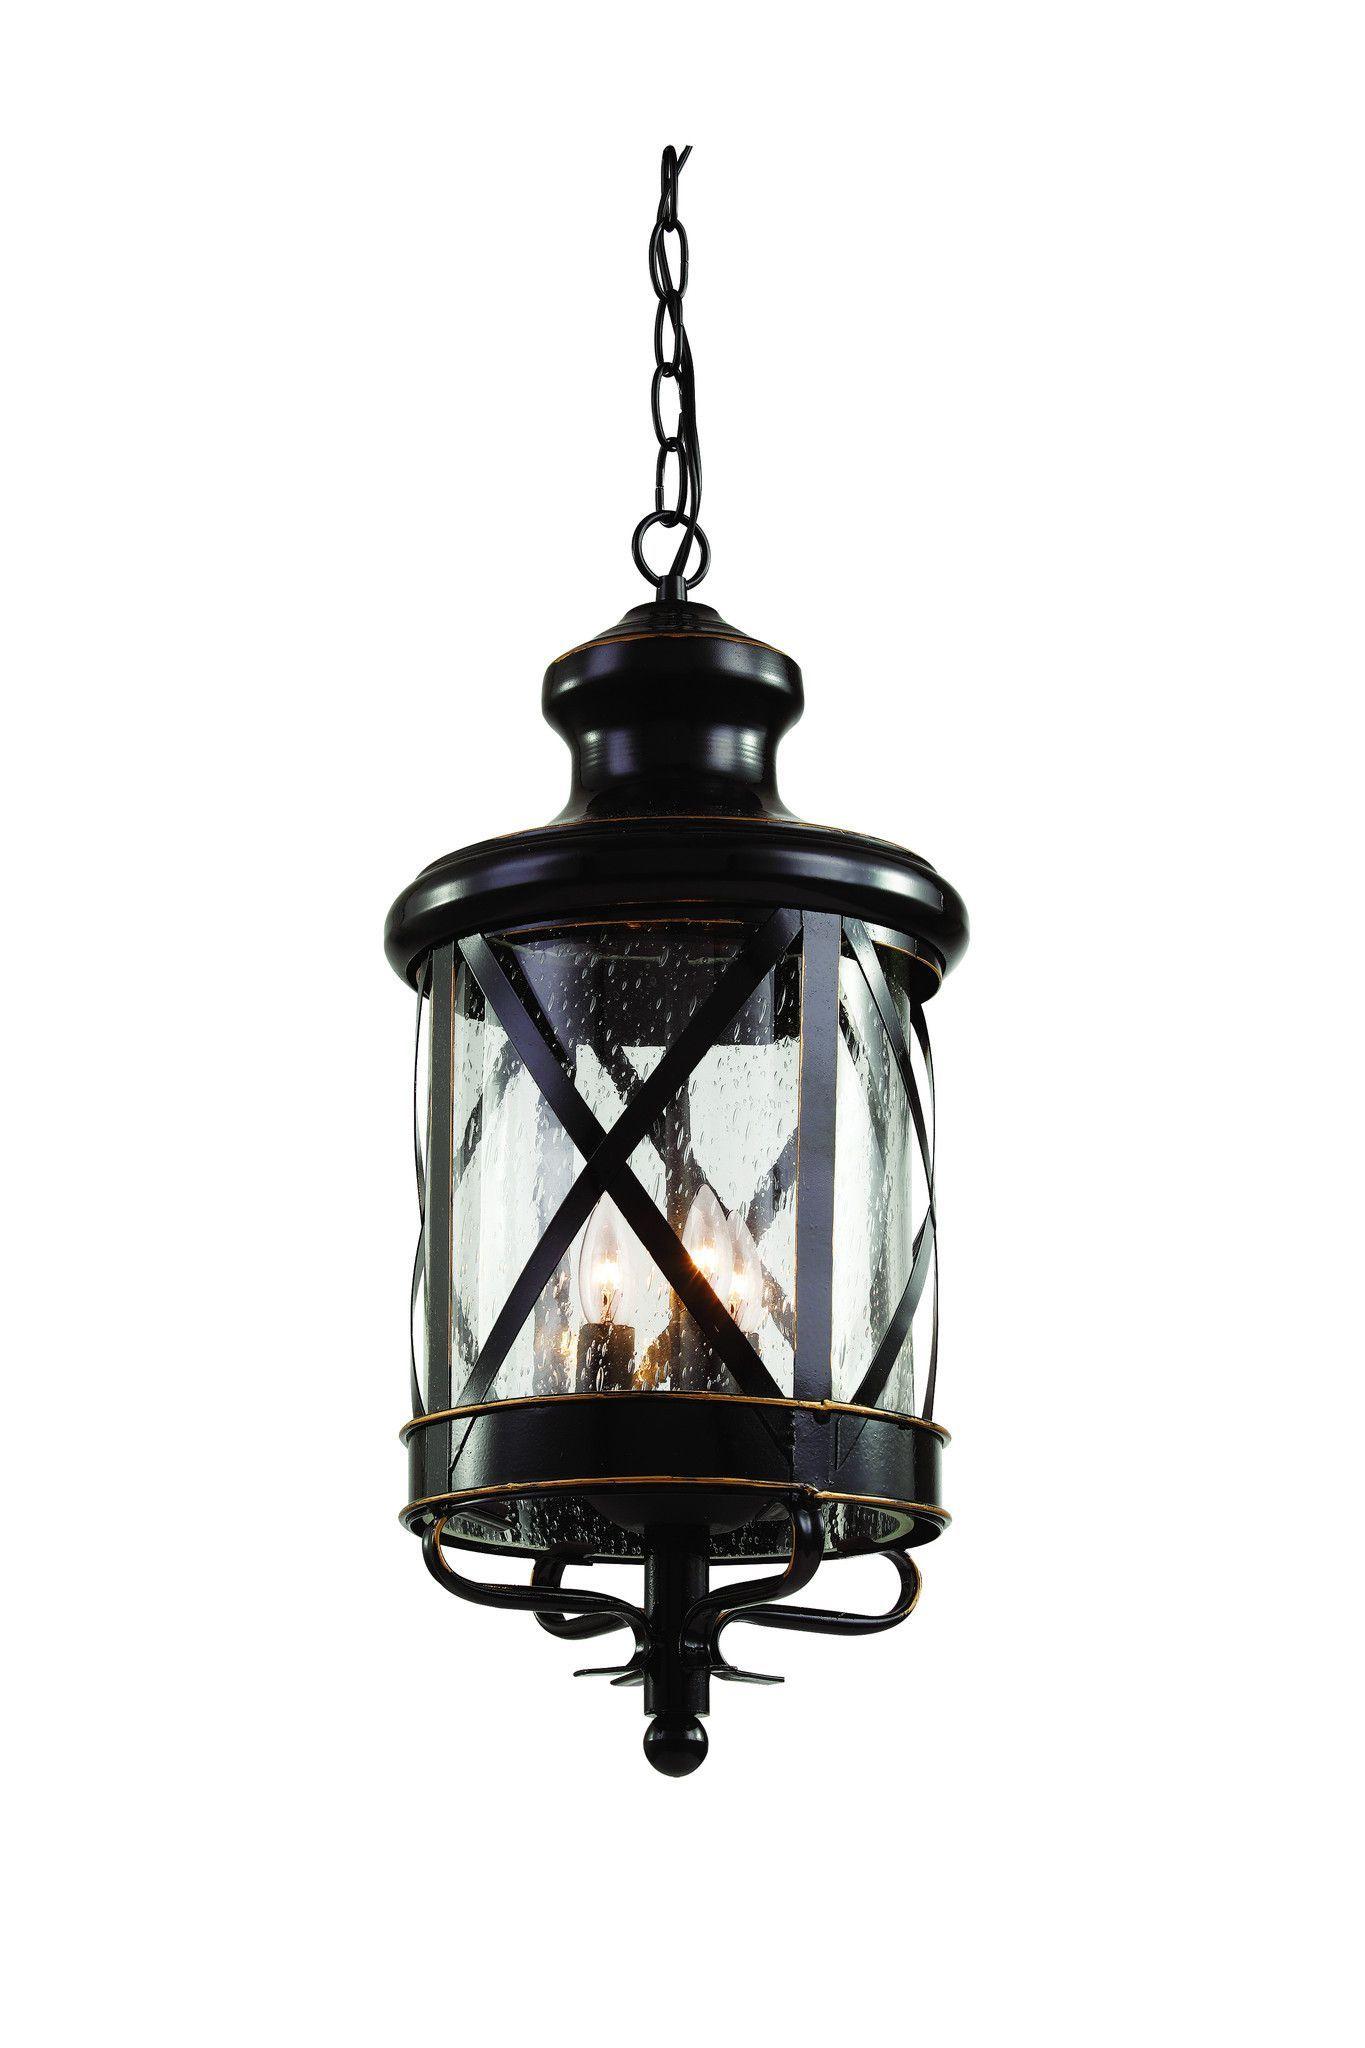 trans globe lighting 5124 rob new england coast 20 high outdoor